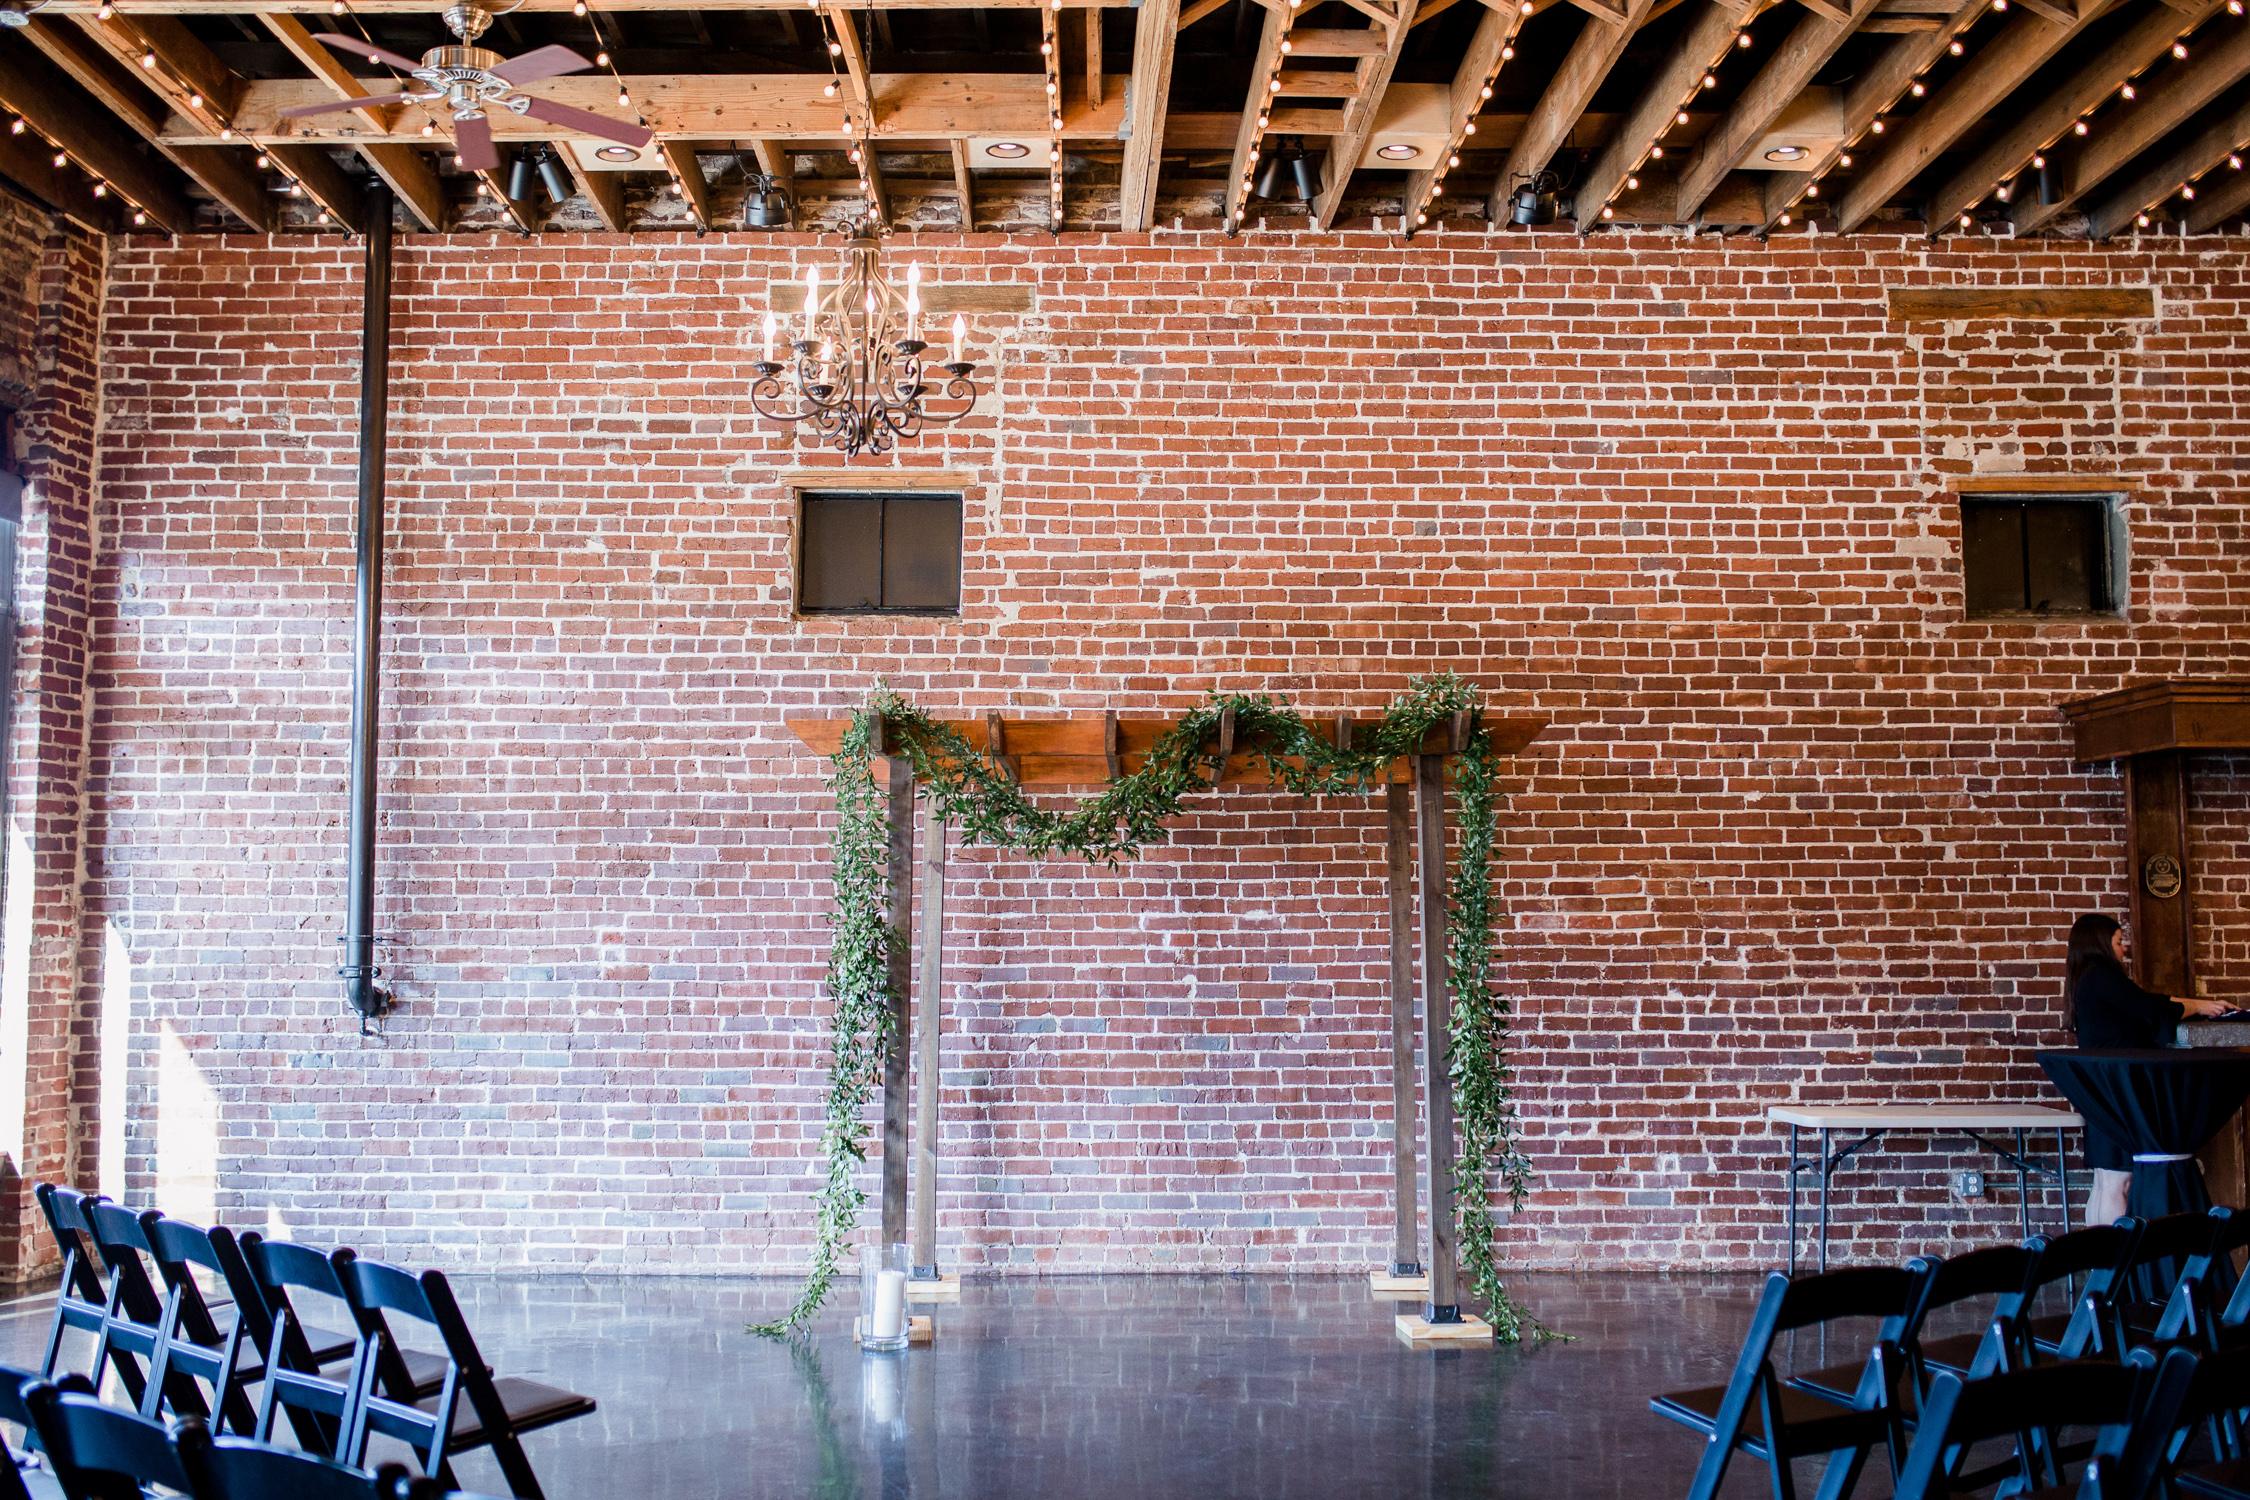 Downtown Knoxville Wedding Venue // Central Avenue Reception // Exposed Brick Indoor Urban Wedding